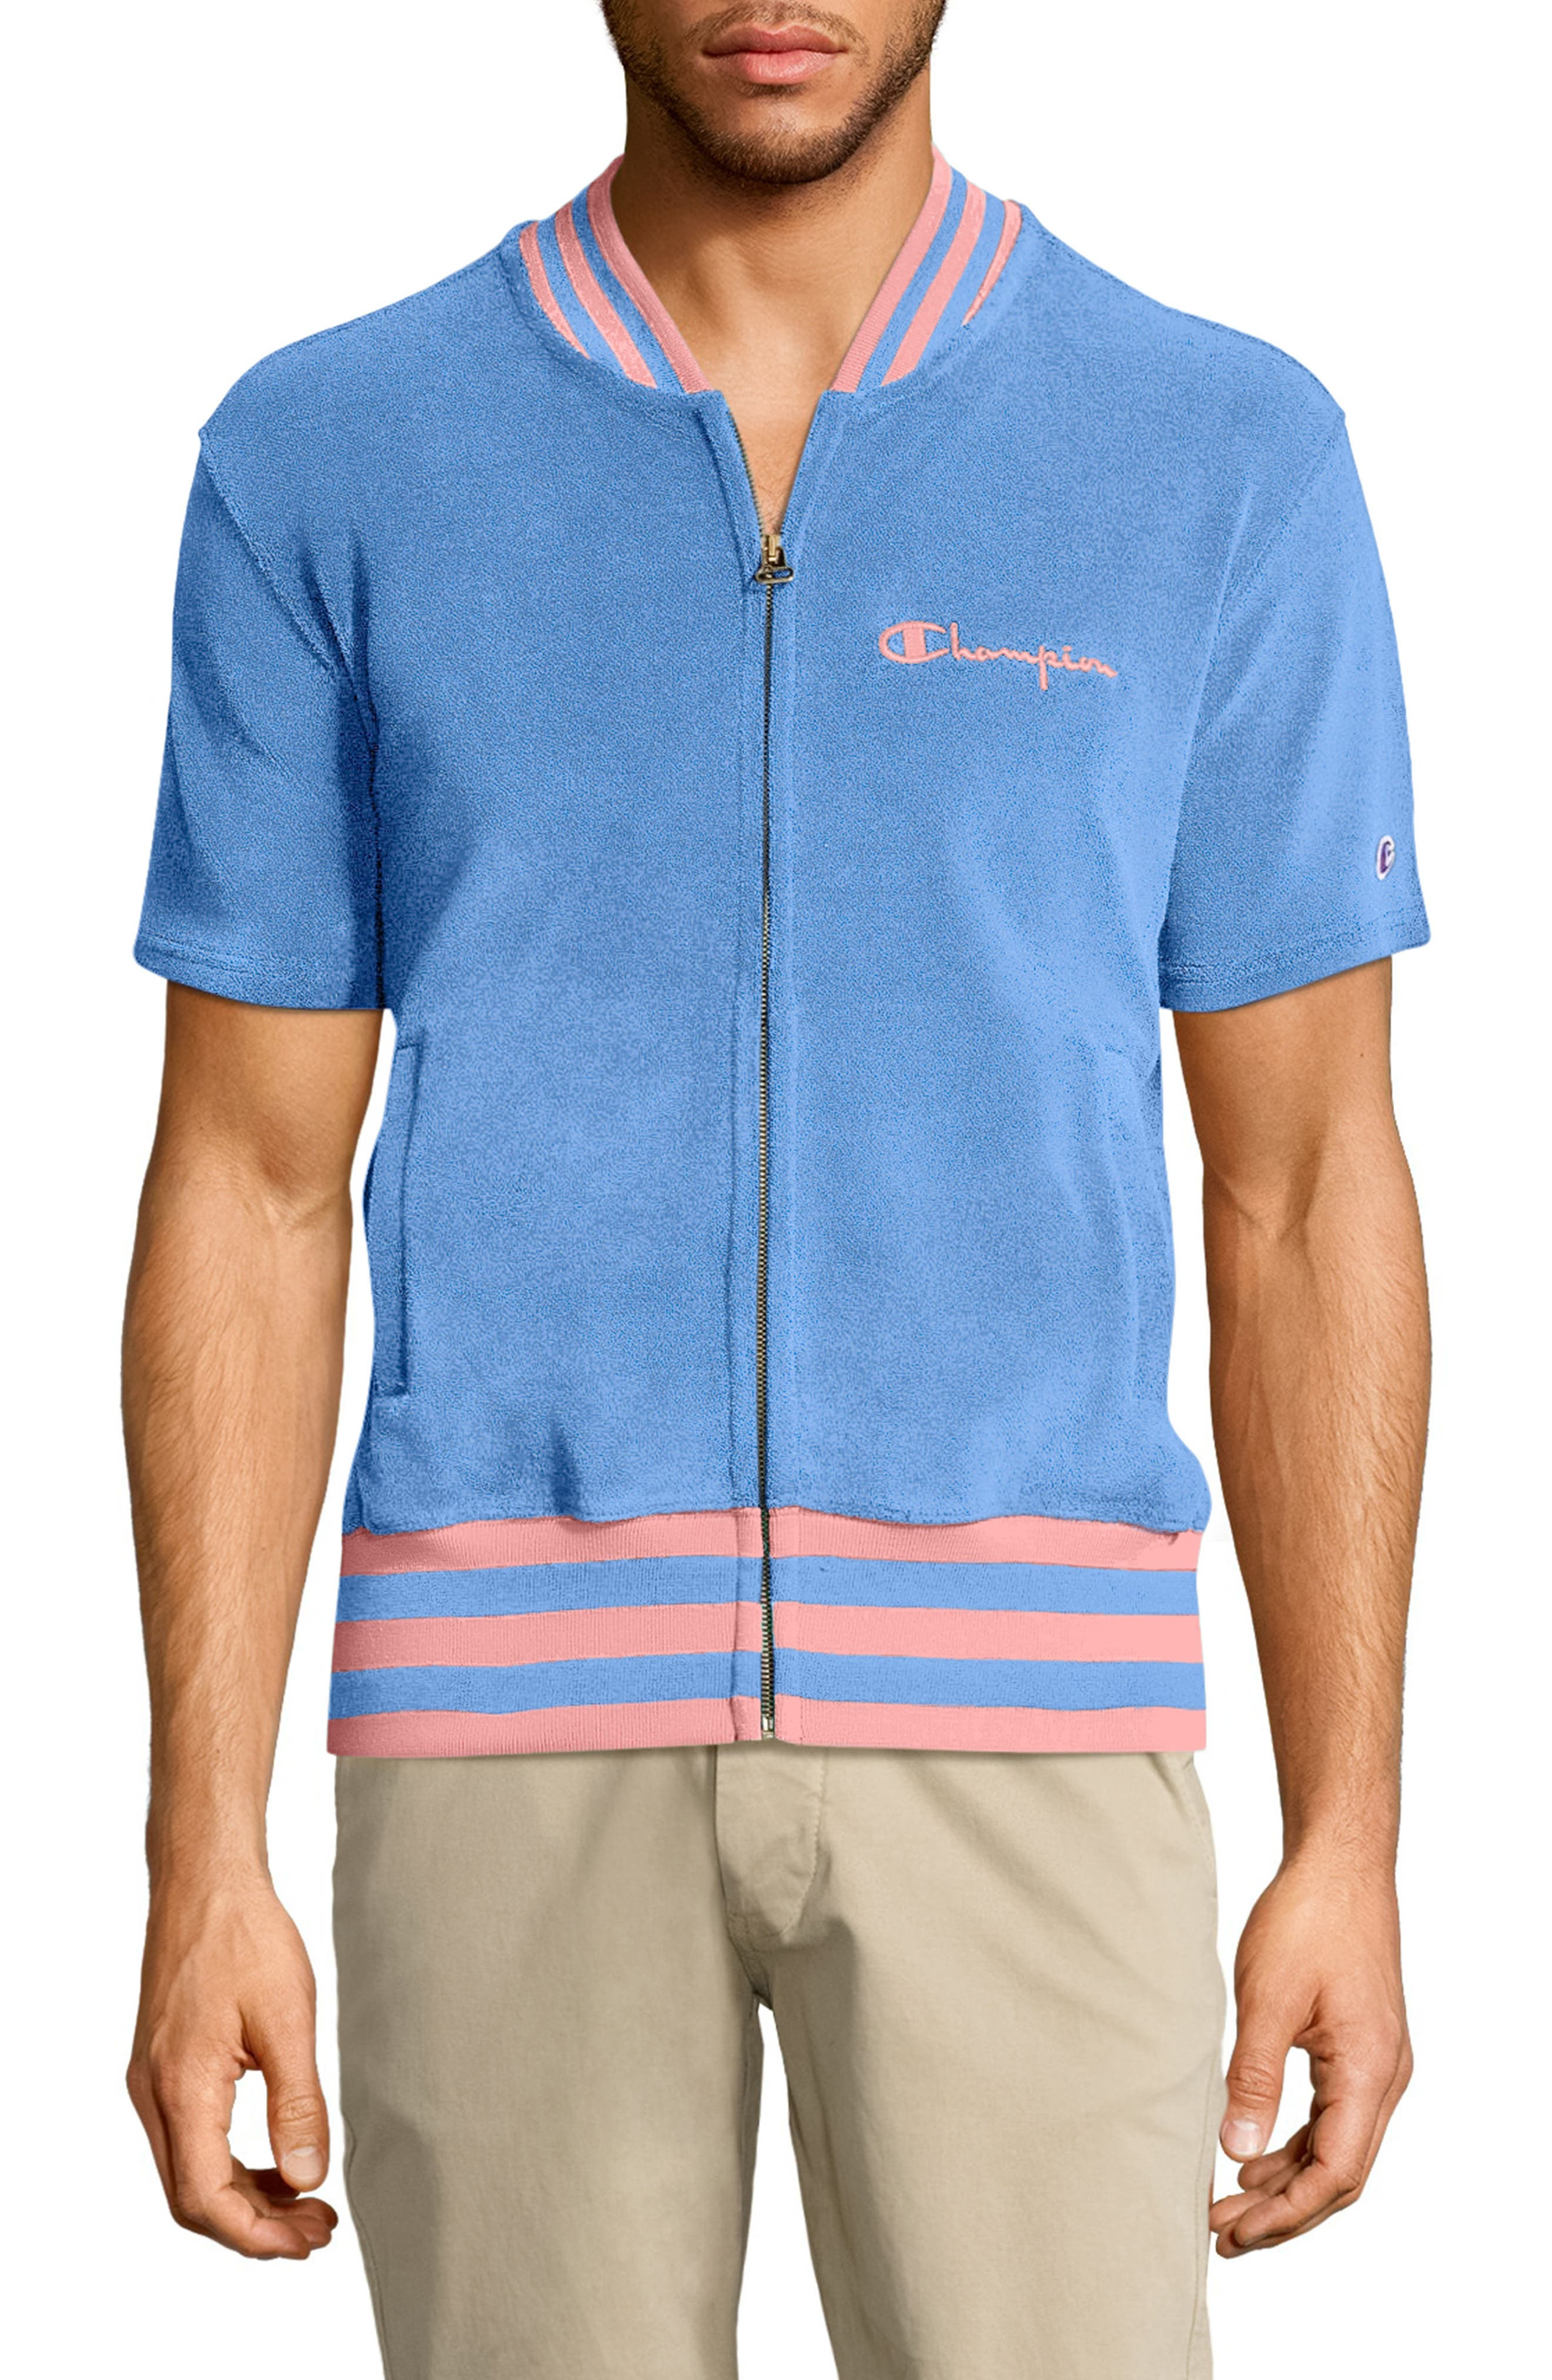 Sponge Terry Stripe Full Zip Sweatshirt,                             Main thumbnail 1, color,                             Swiss Blue